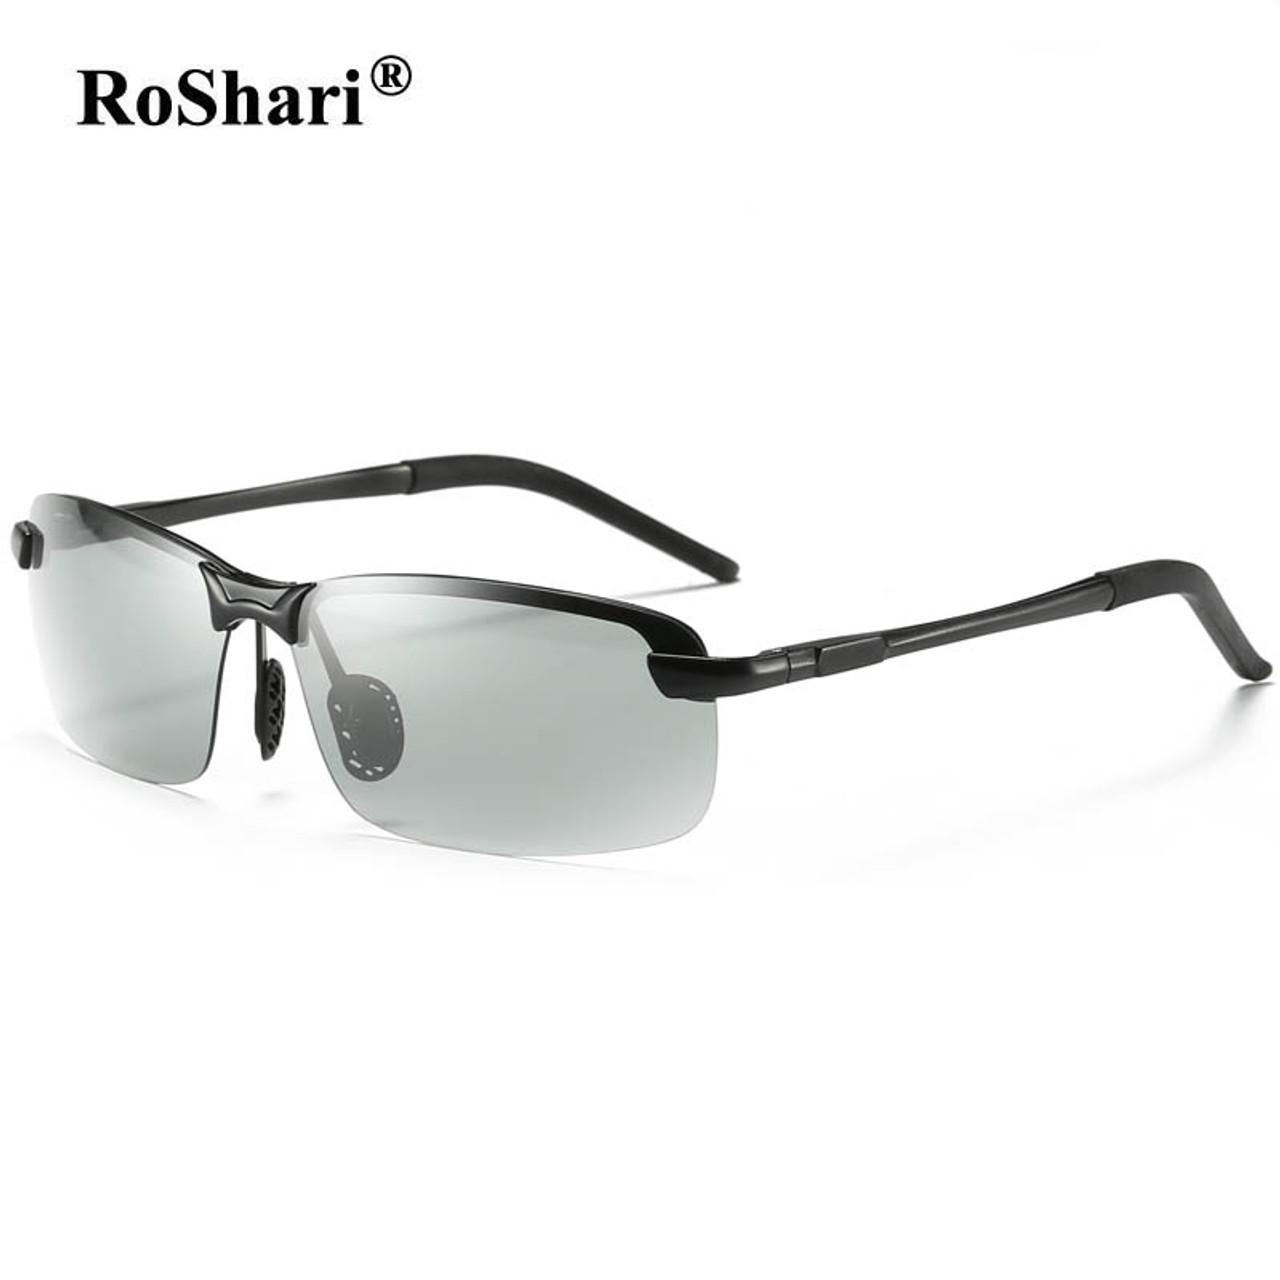 1e141ed24dc ... RoShari Driving Photochromic Sunglasses Men Polarized Chameleon  Discoloration Sun glasses for men oculos de sol masculino ...